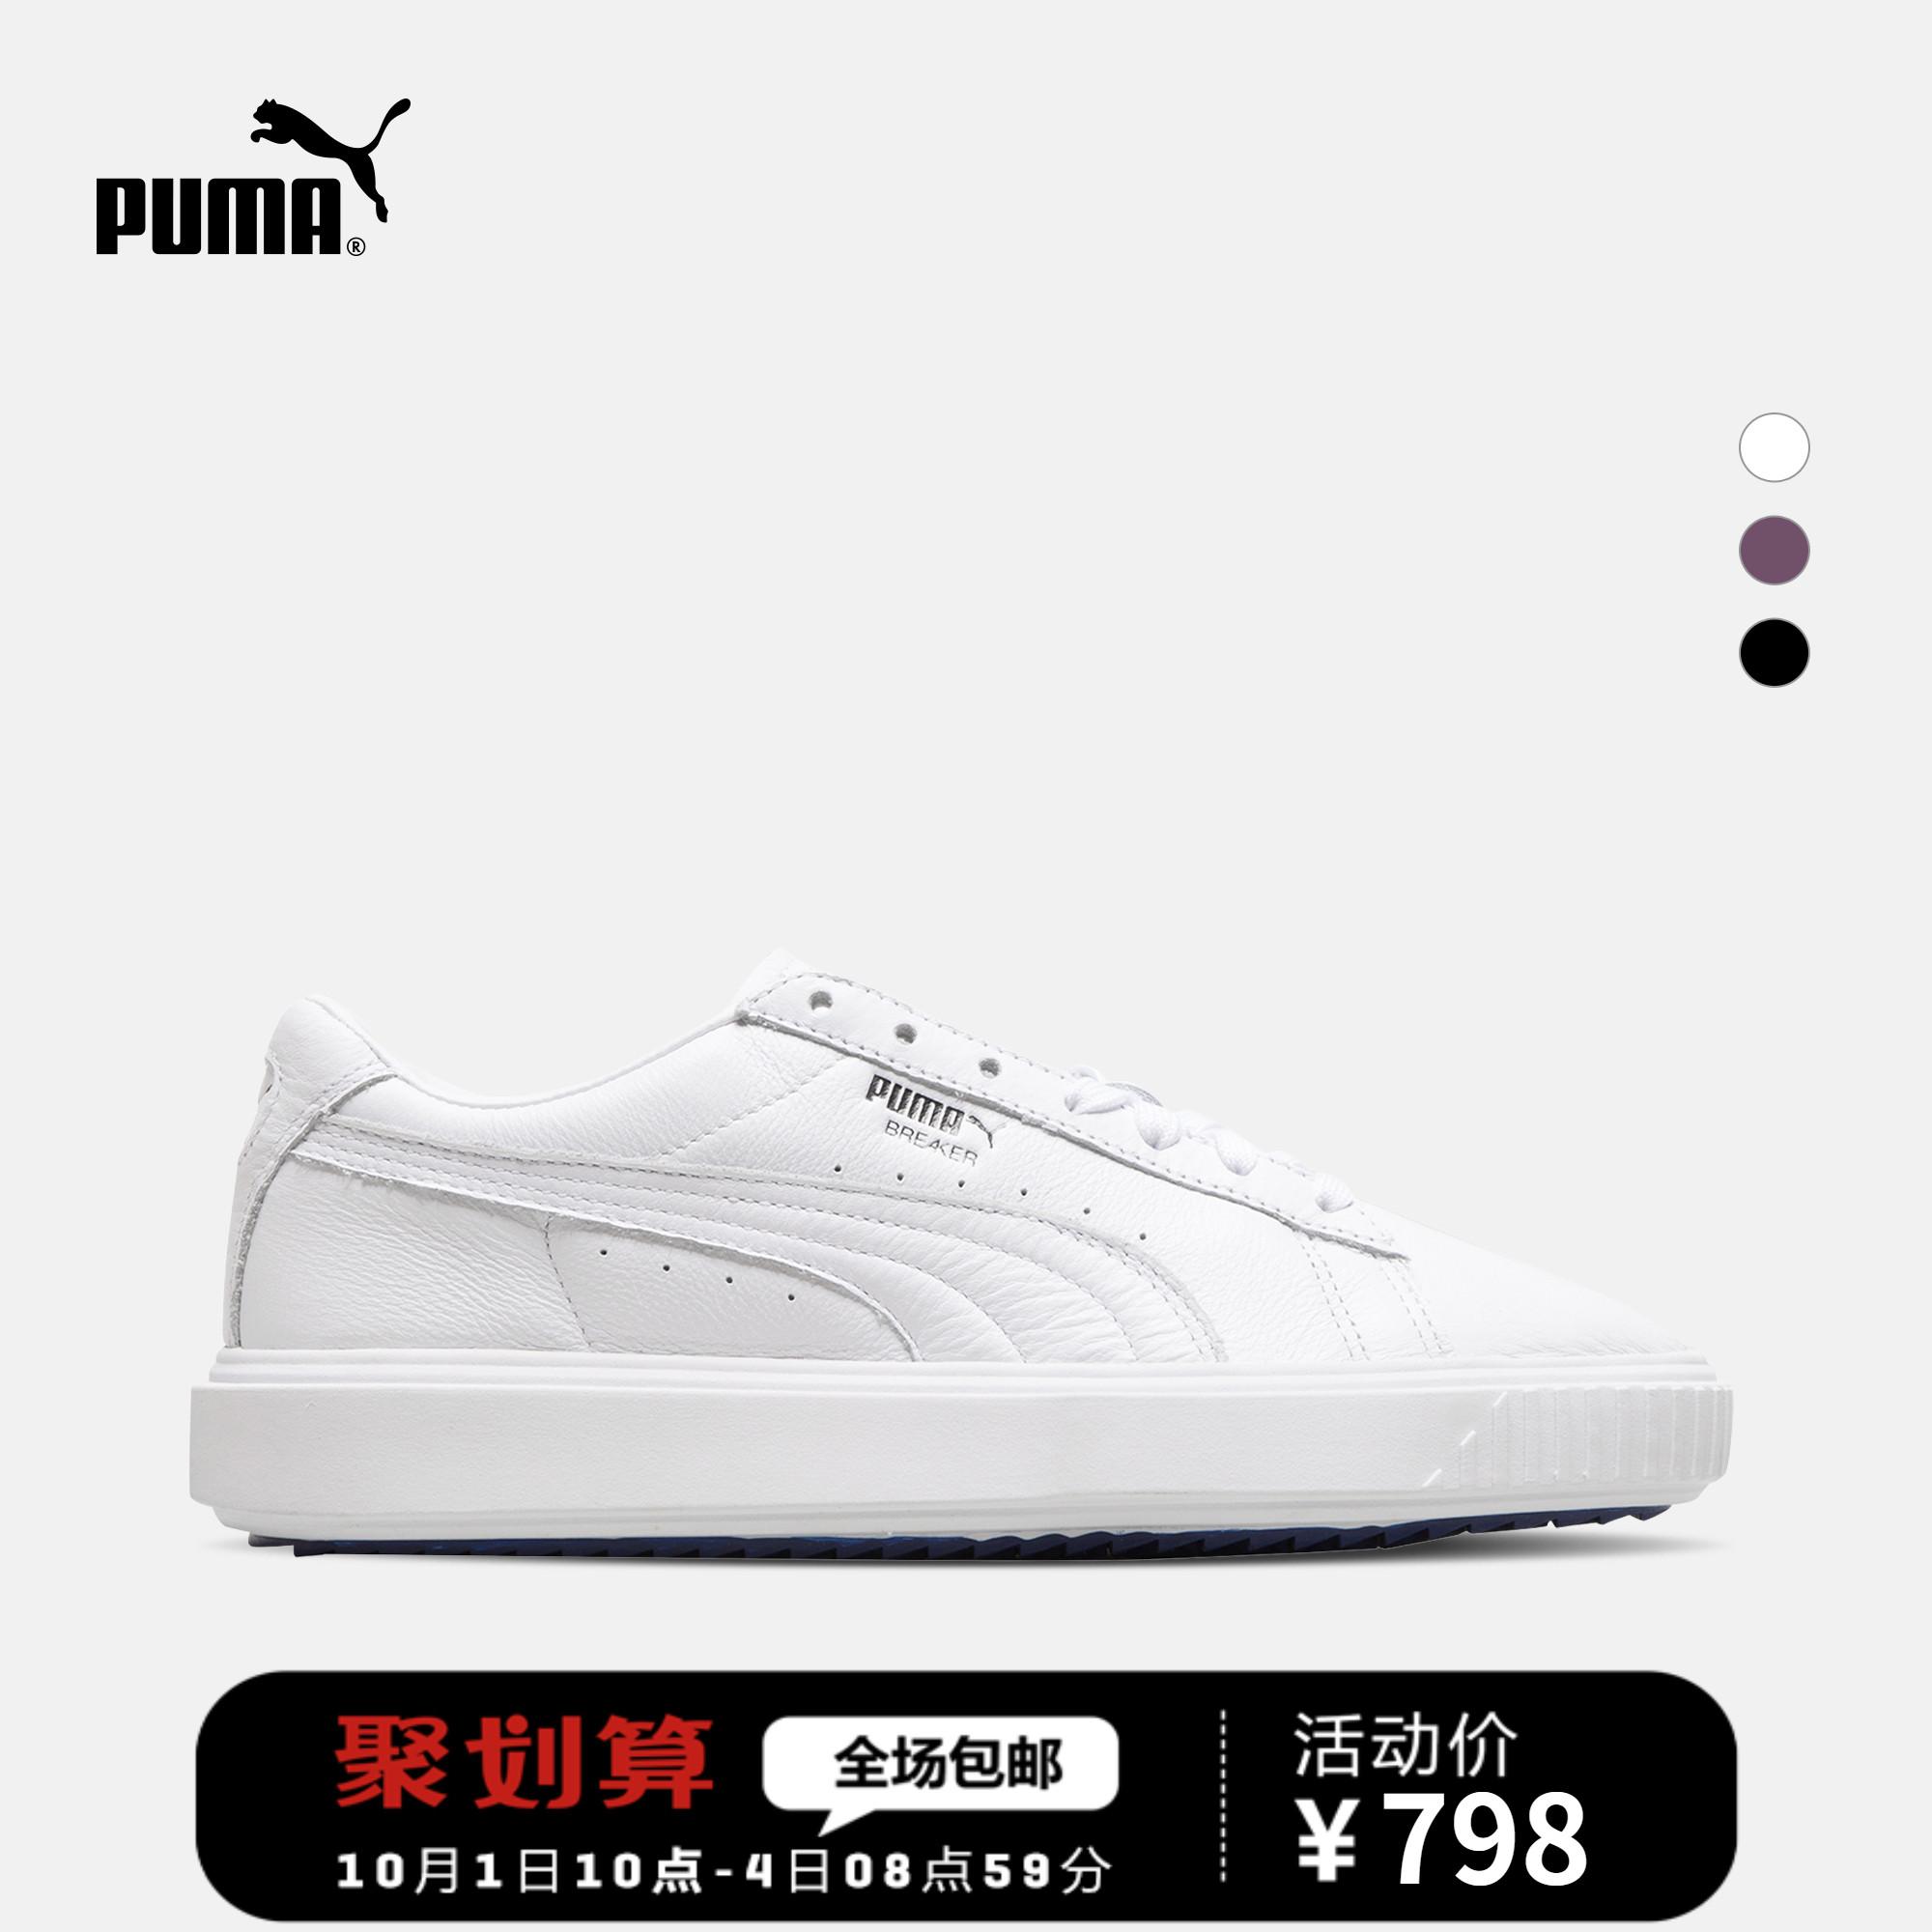 PUMA彪马官方 男女同款休闲鞋 Breaker Leather 366620